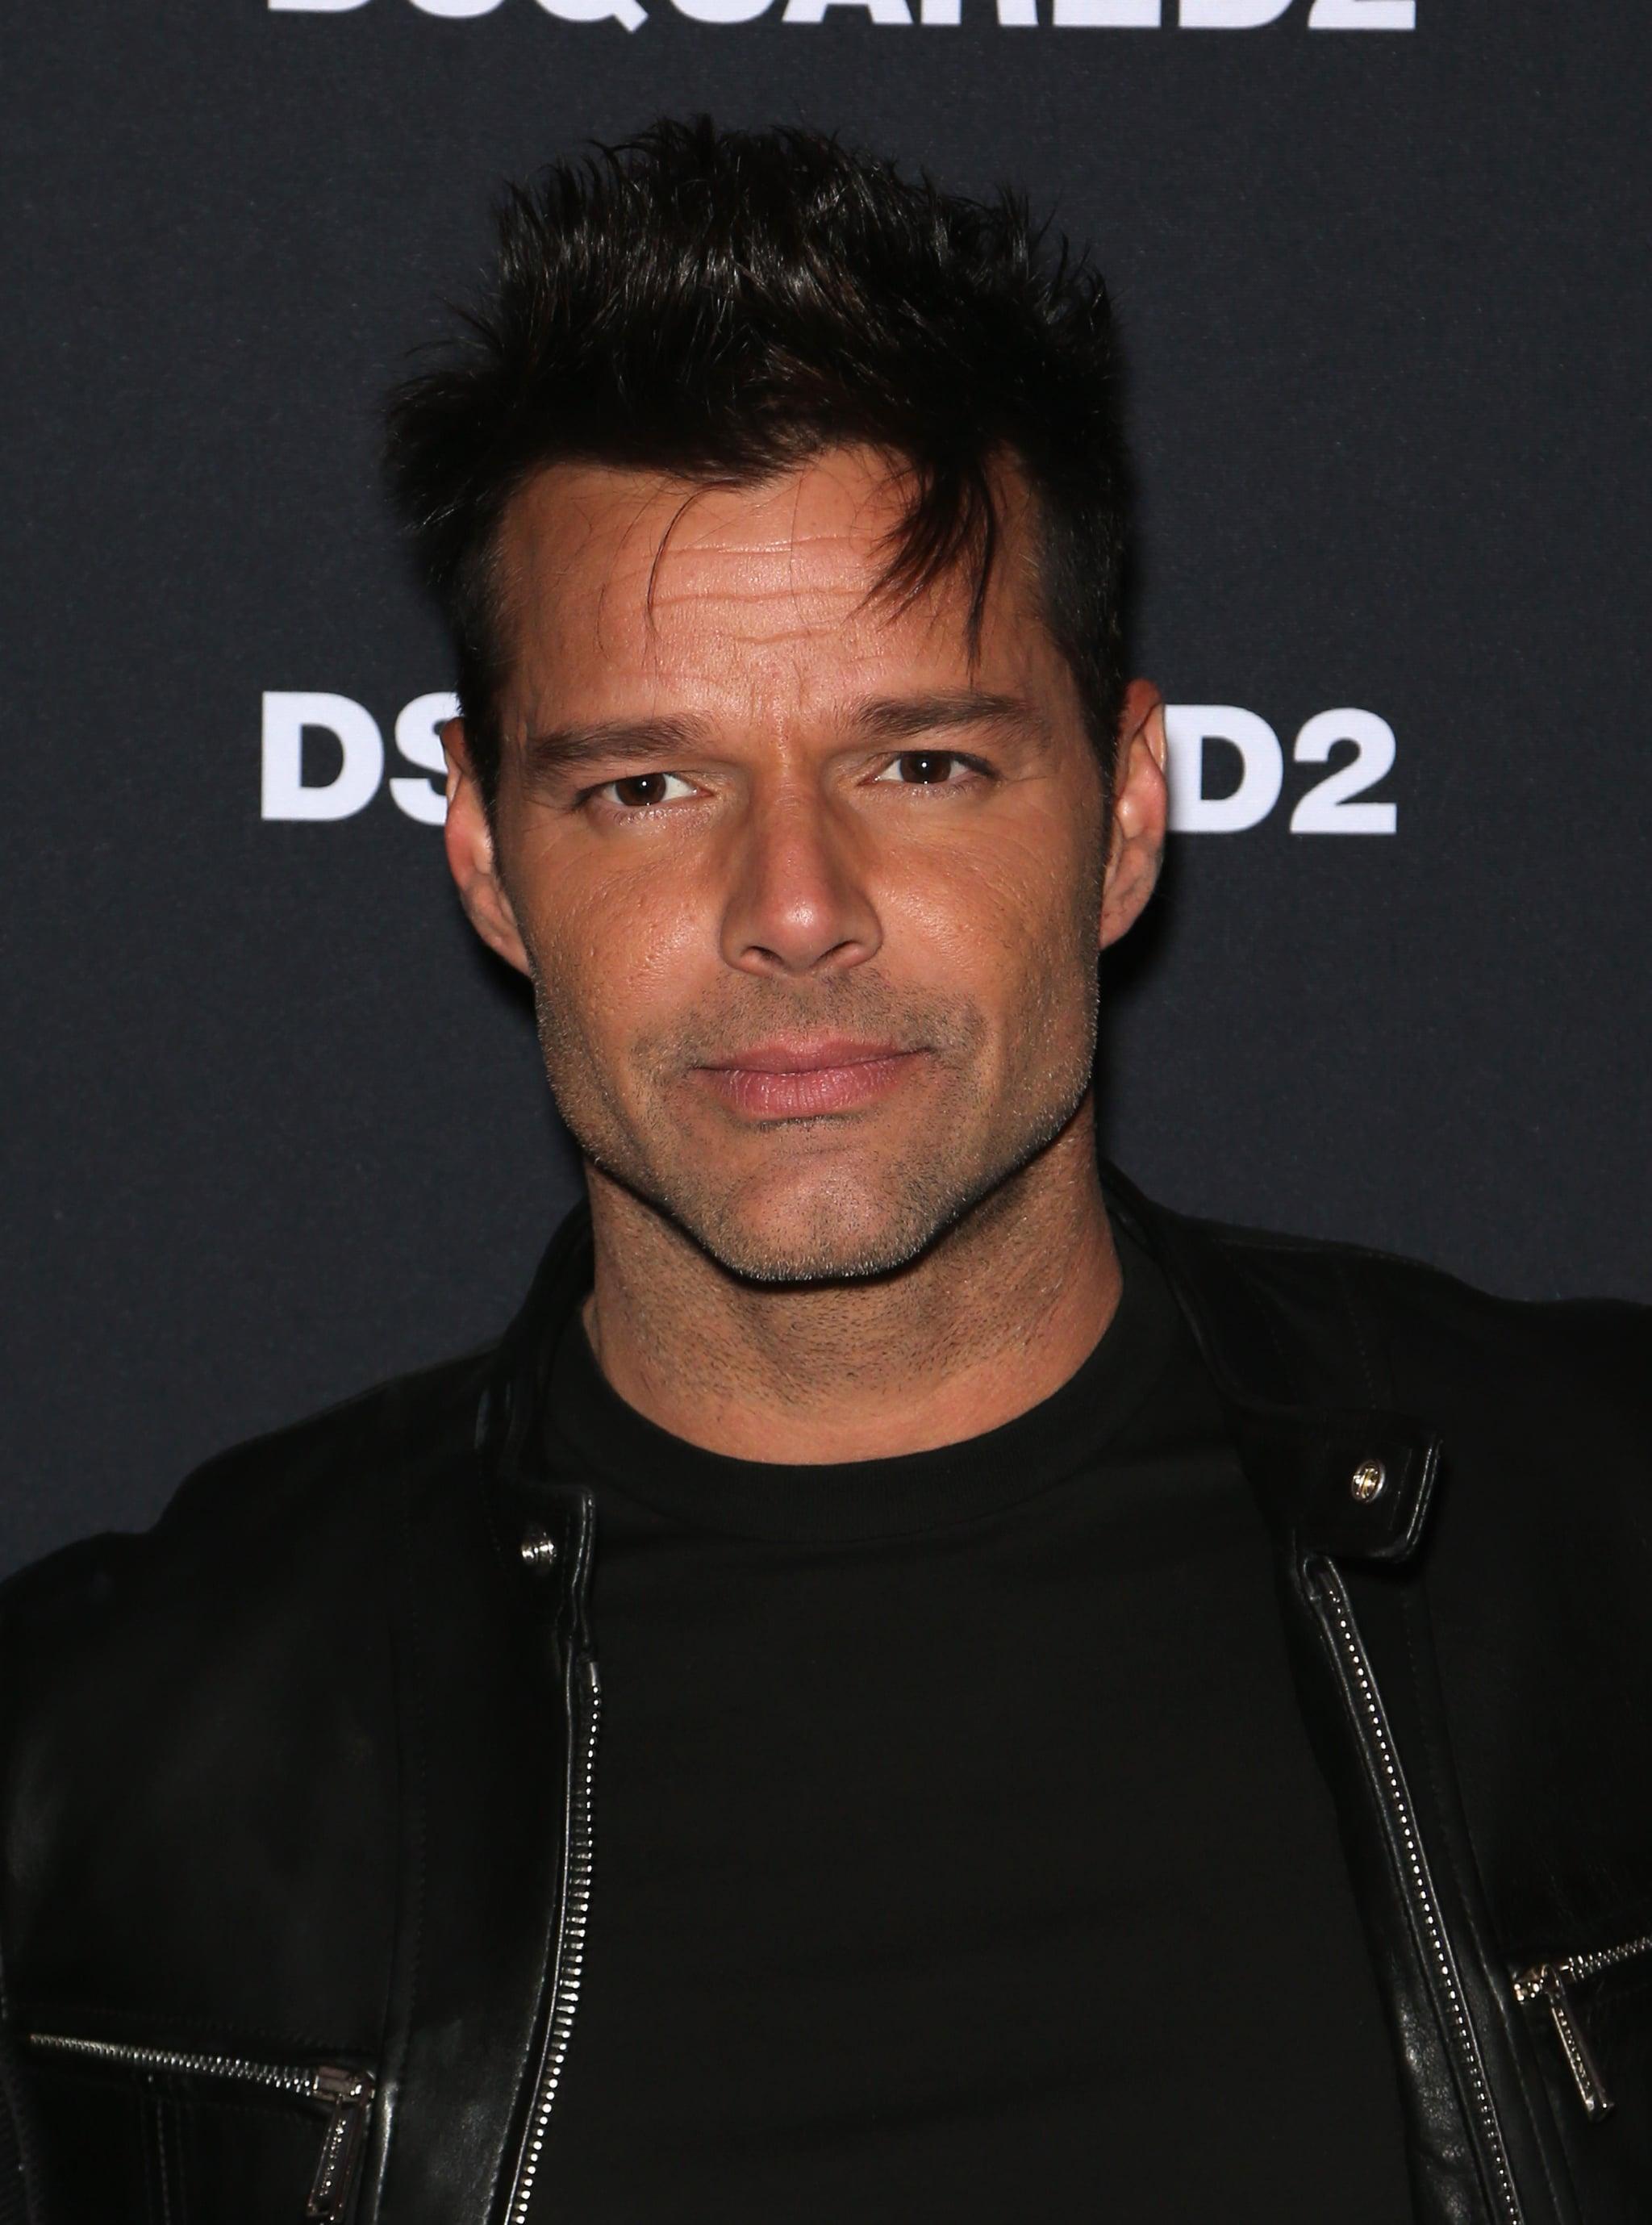 Ricky martin cast in versace american crime story - Antonio martin morales ...